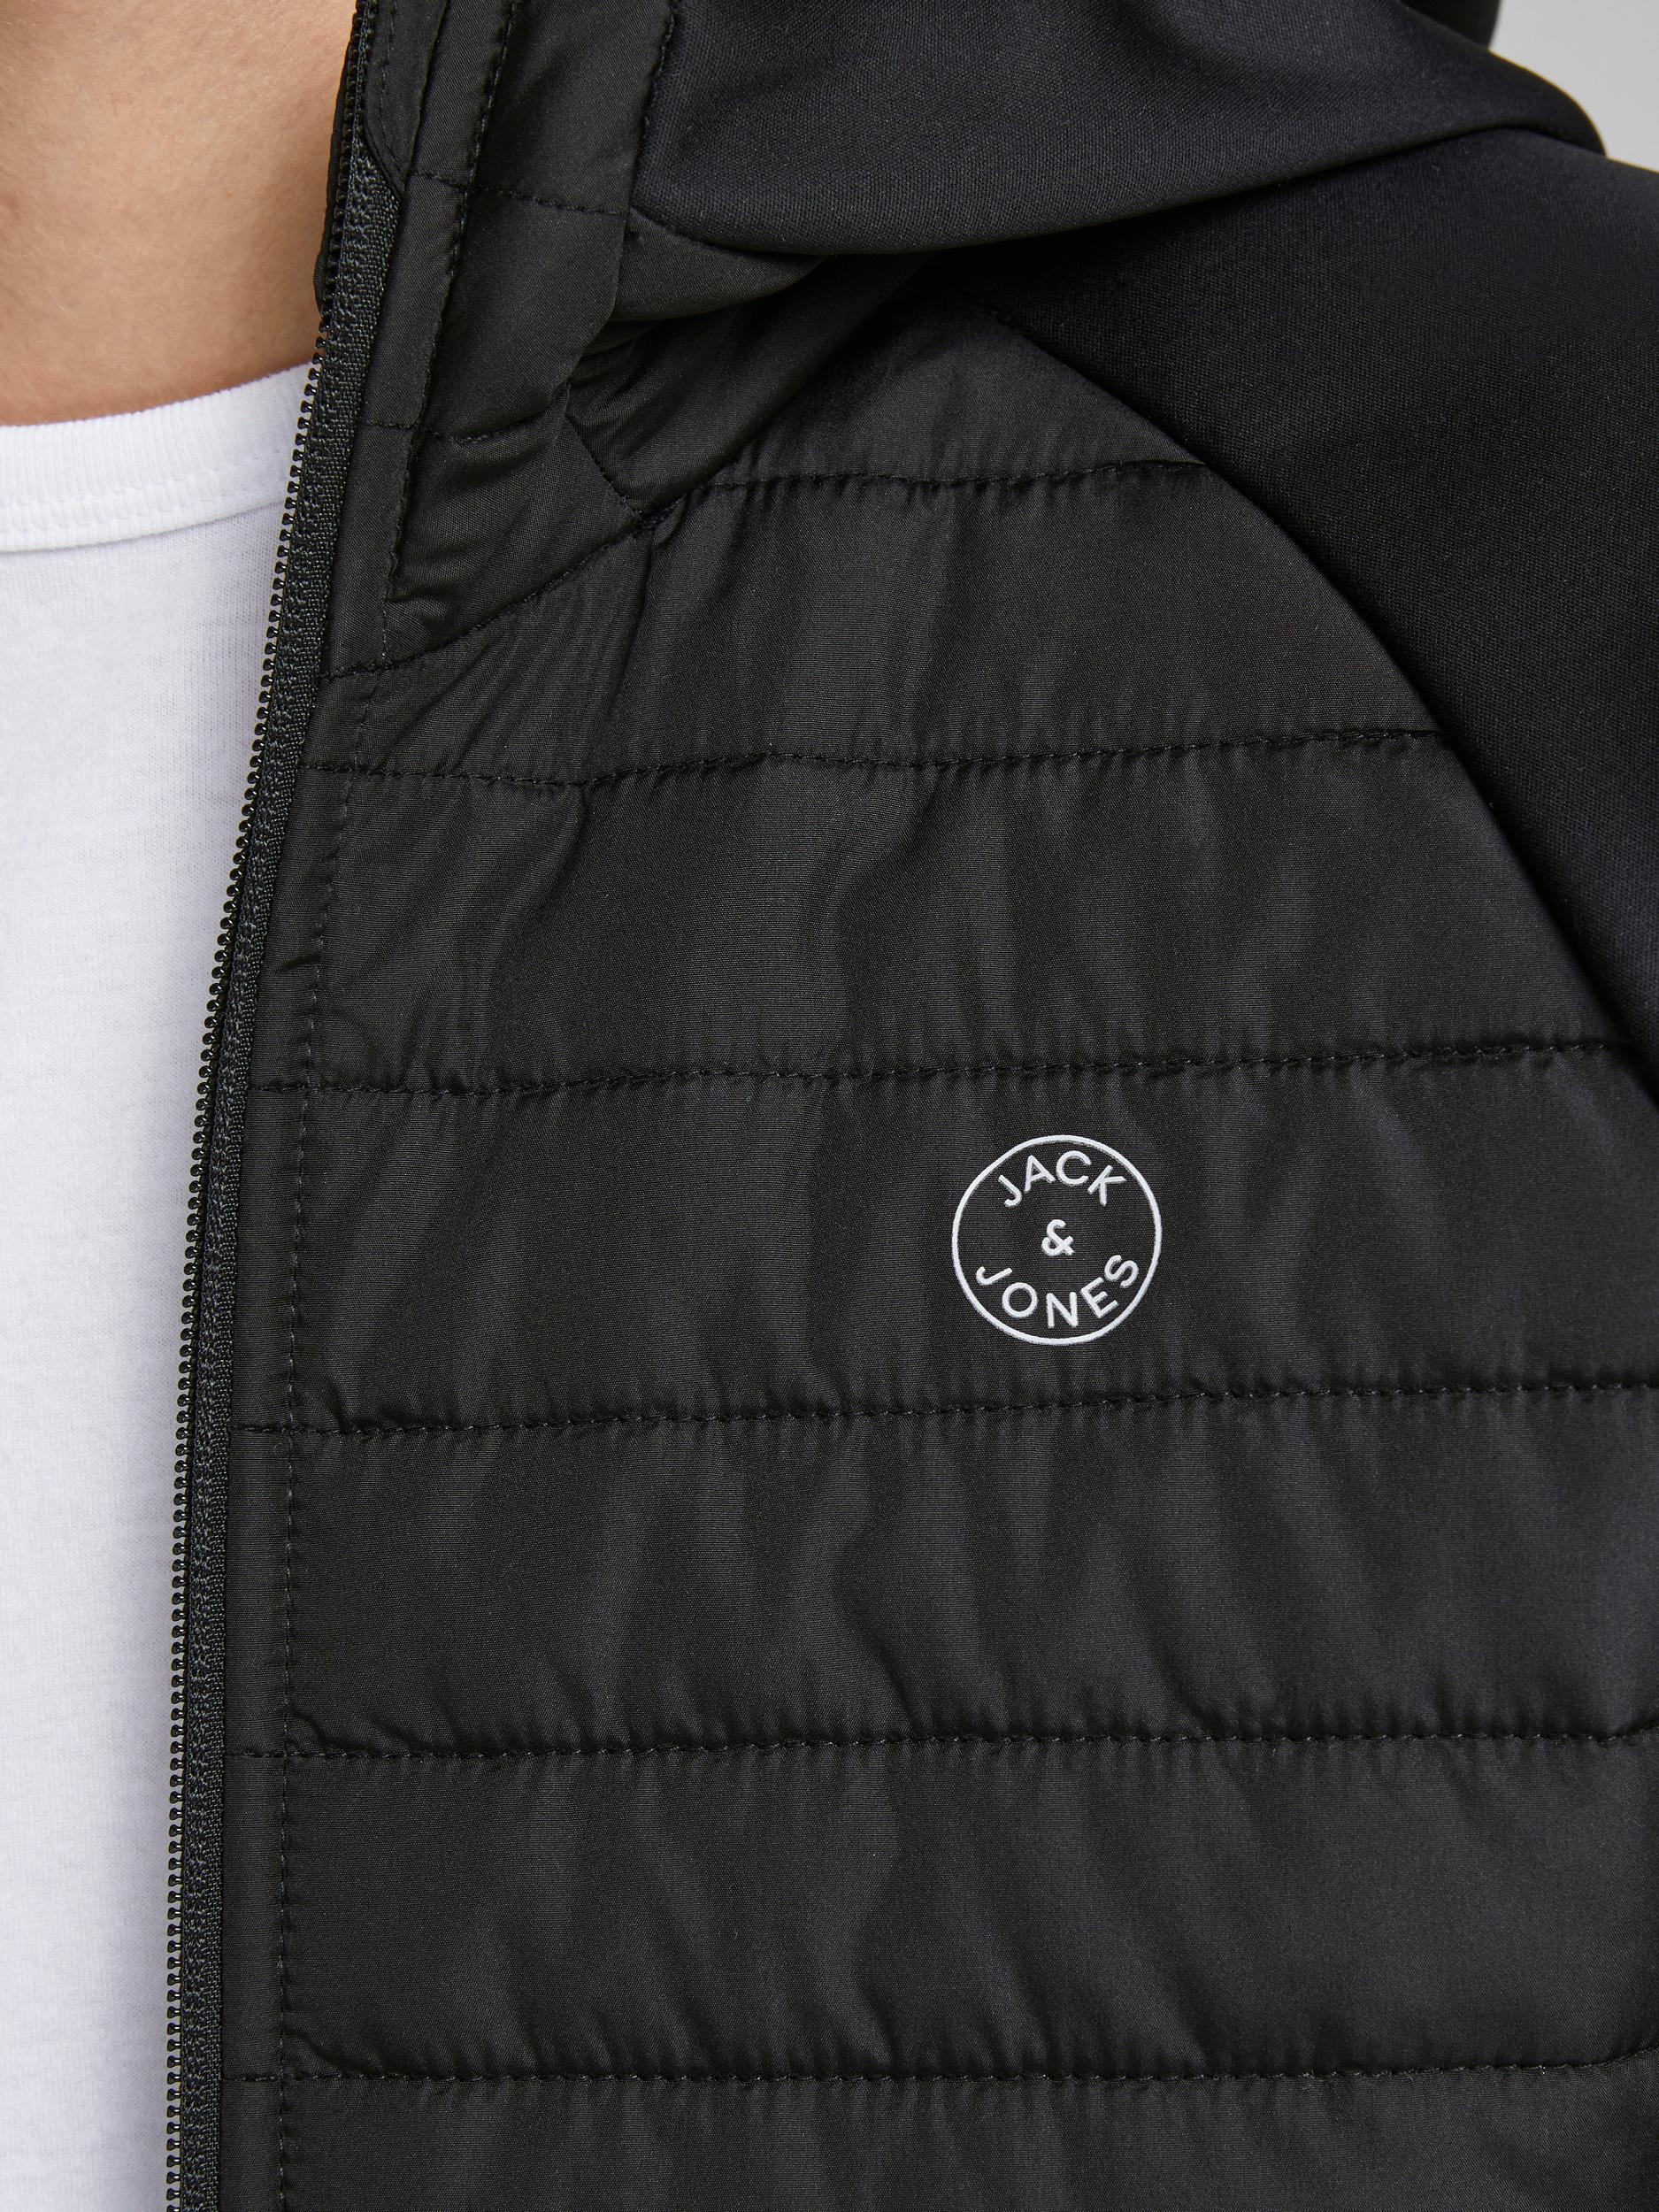 Jack & Jones Multi Quilted jakke, black, x-large